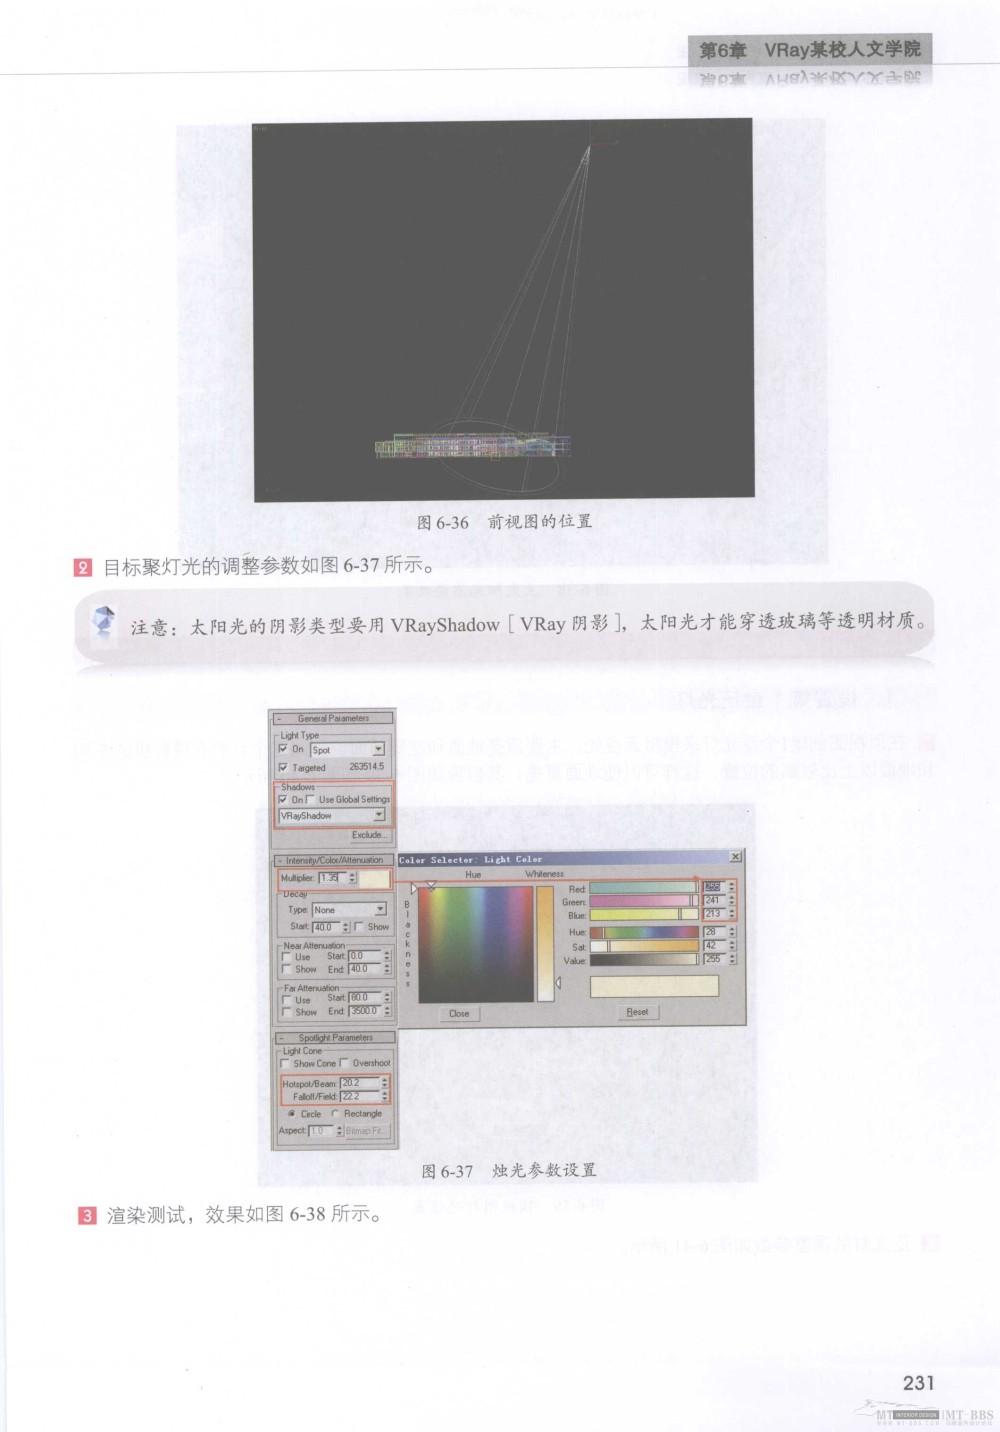 水晶石技法-3ds_Max&VRay室内空间表现_水晶石技法-3ds_Max&VRay室内空间表现_页面_237.jpg